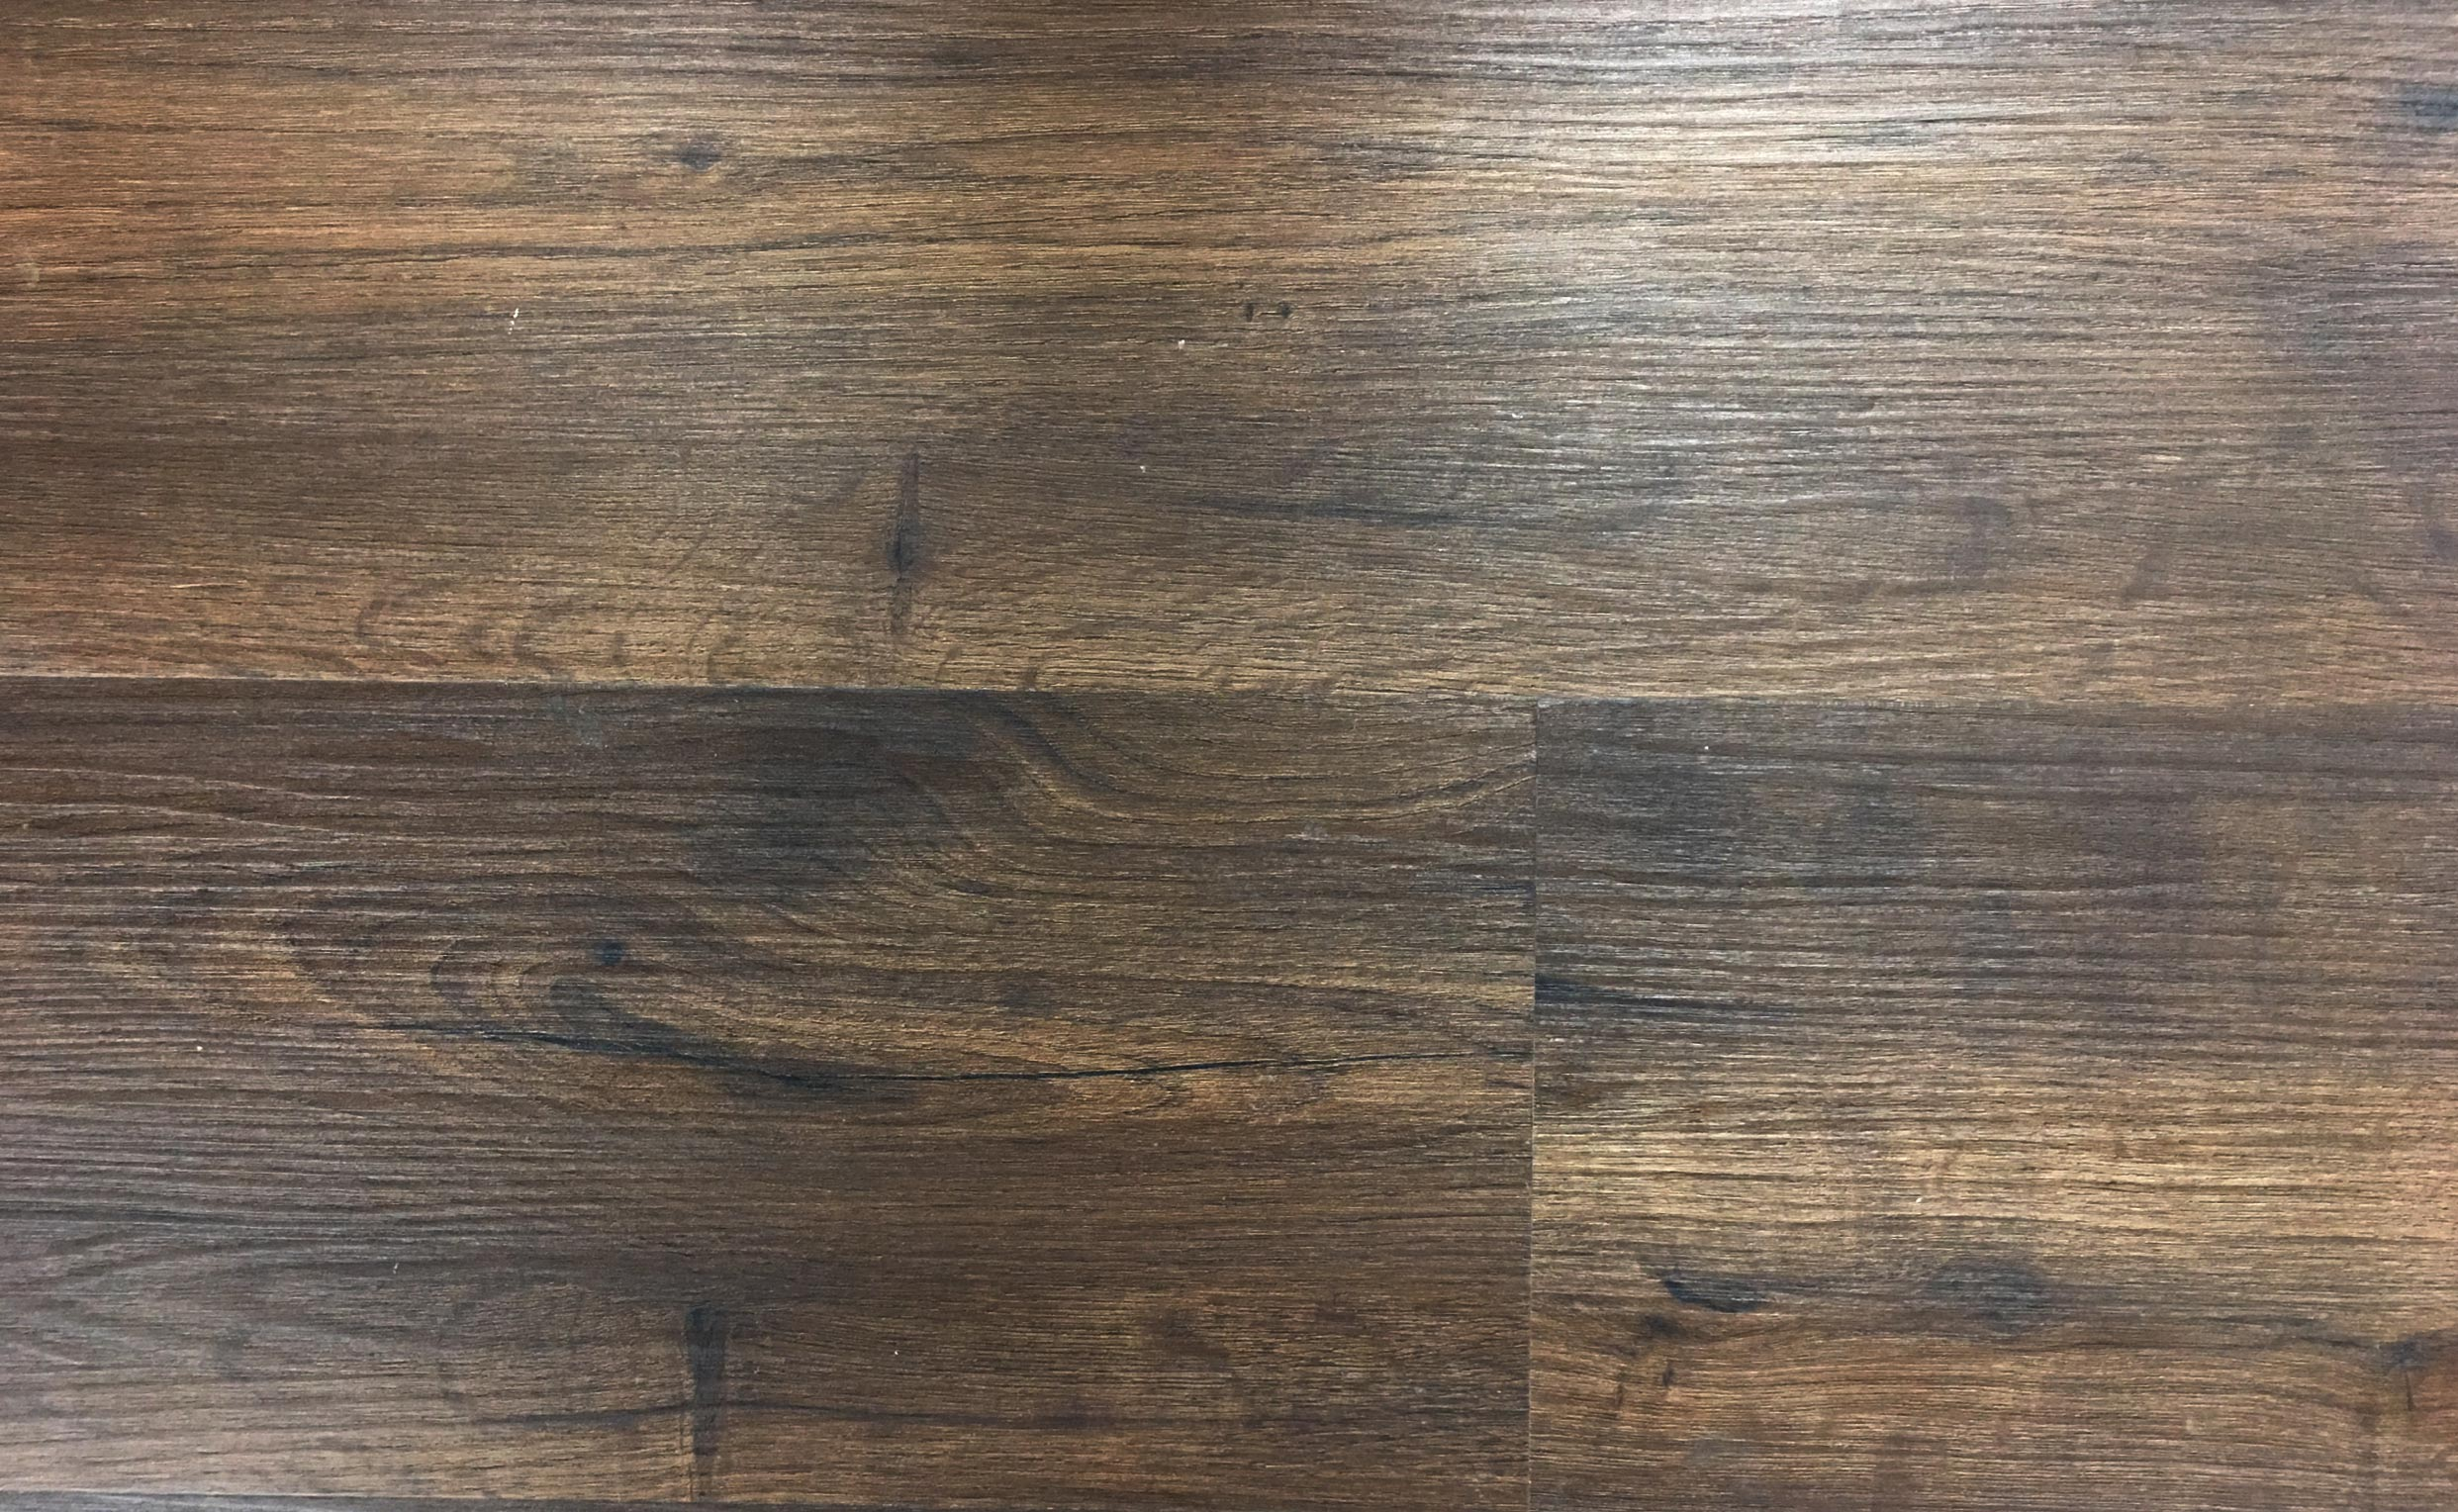 Spc Vinyl Plank 03 Hardwood Planet Flooring